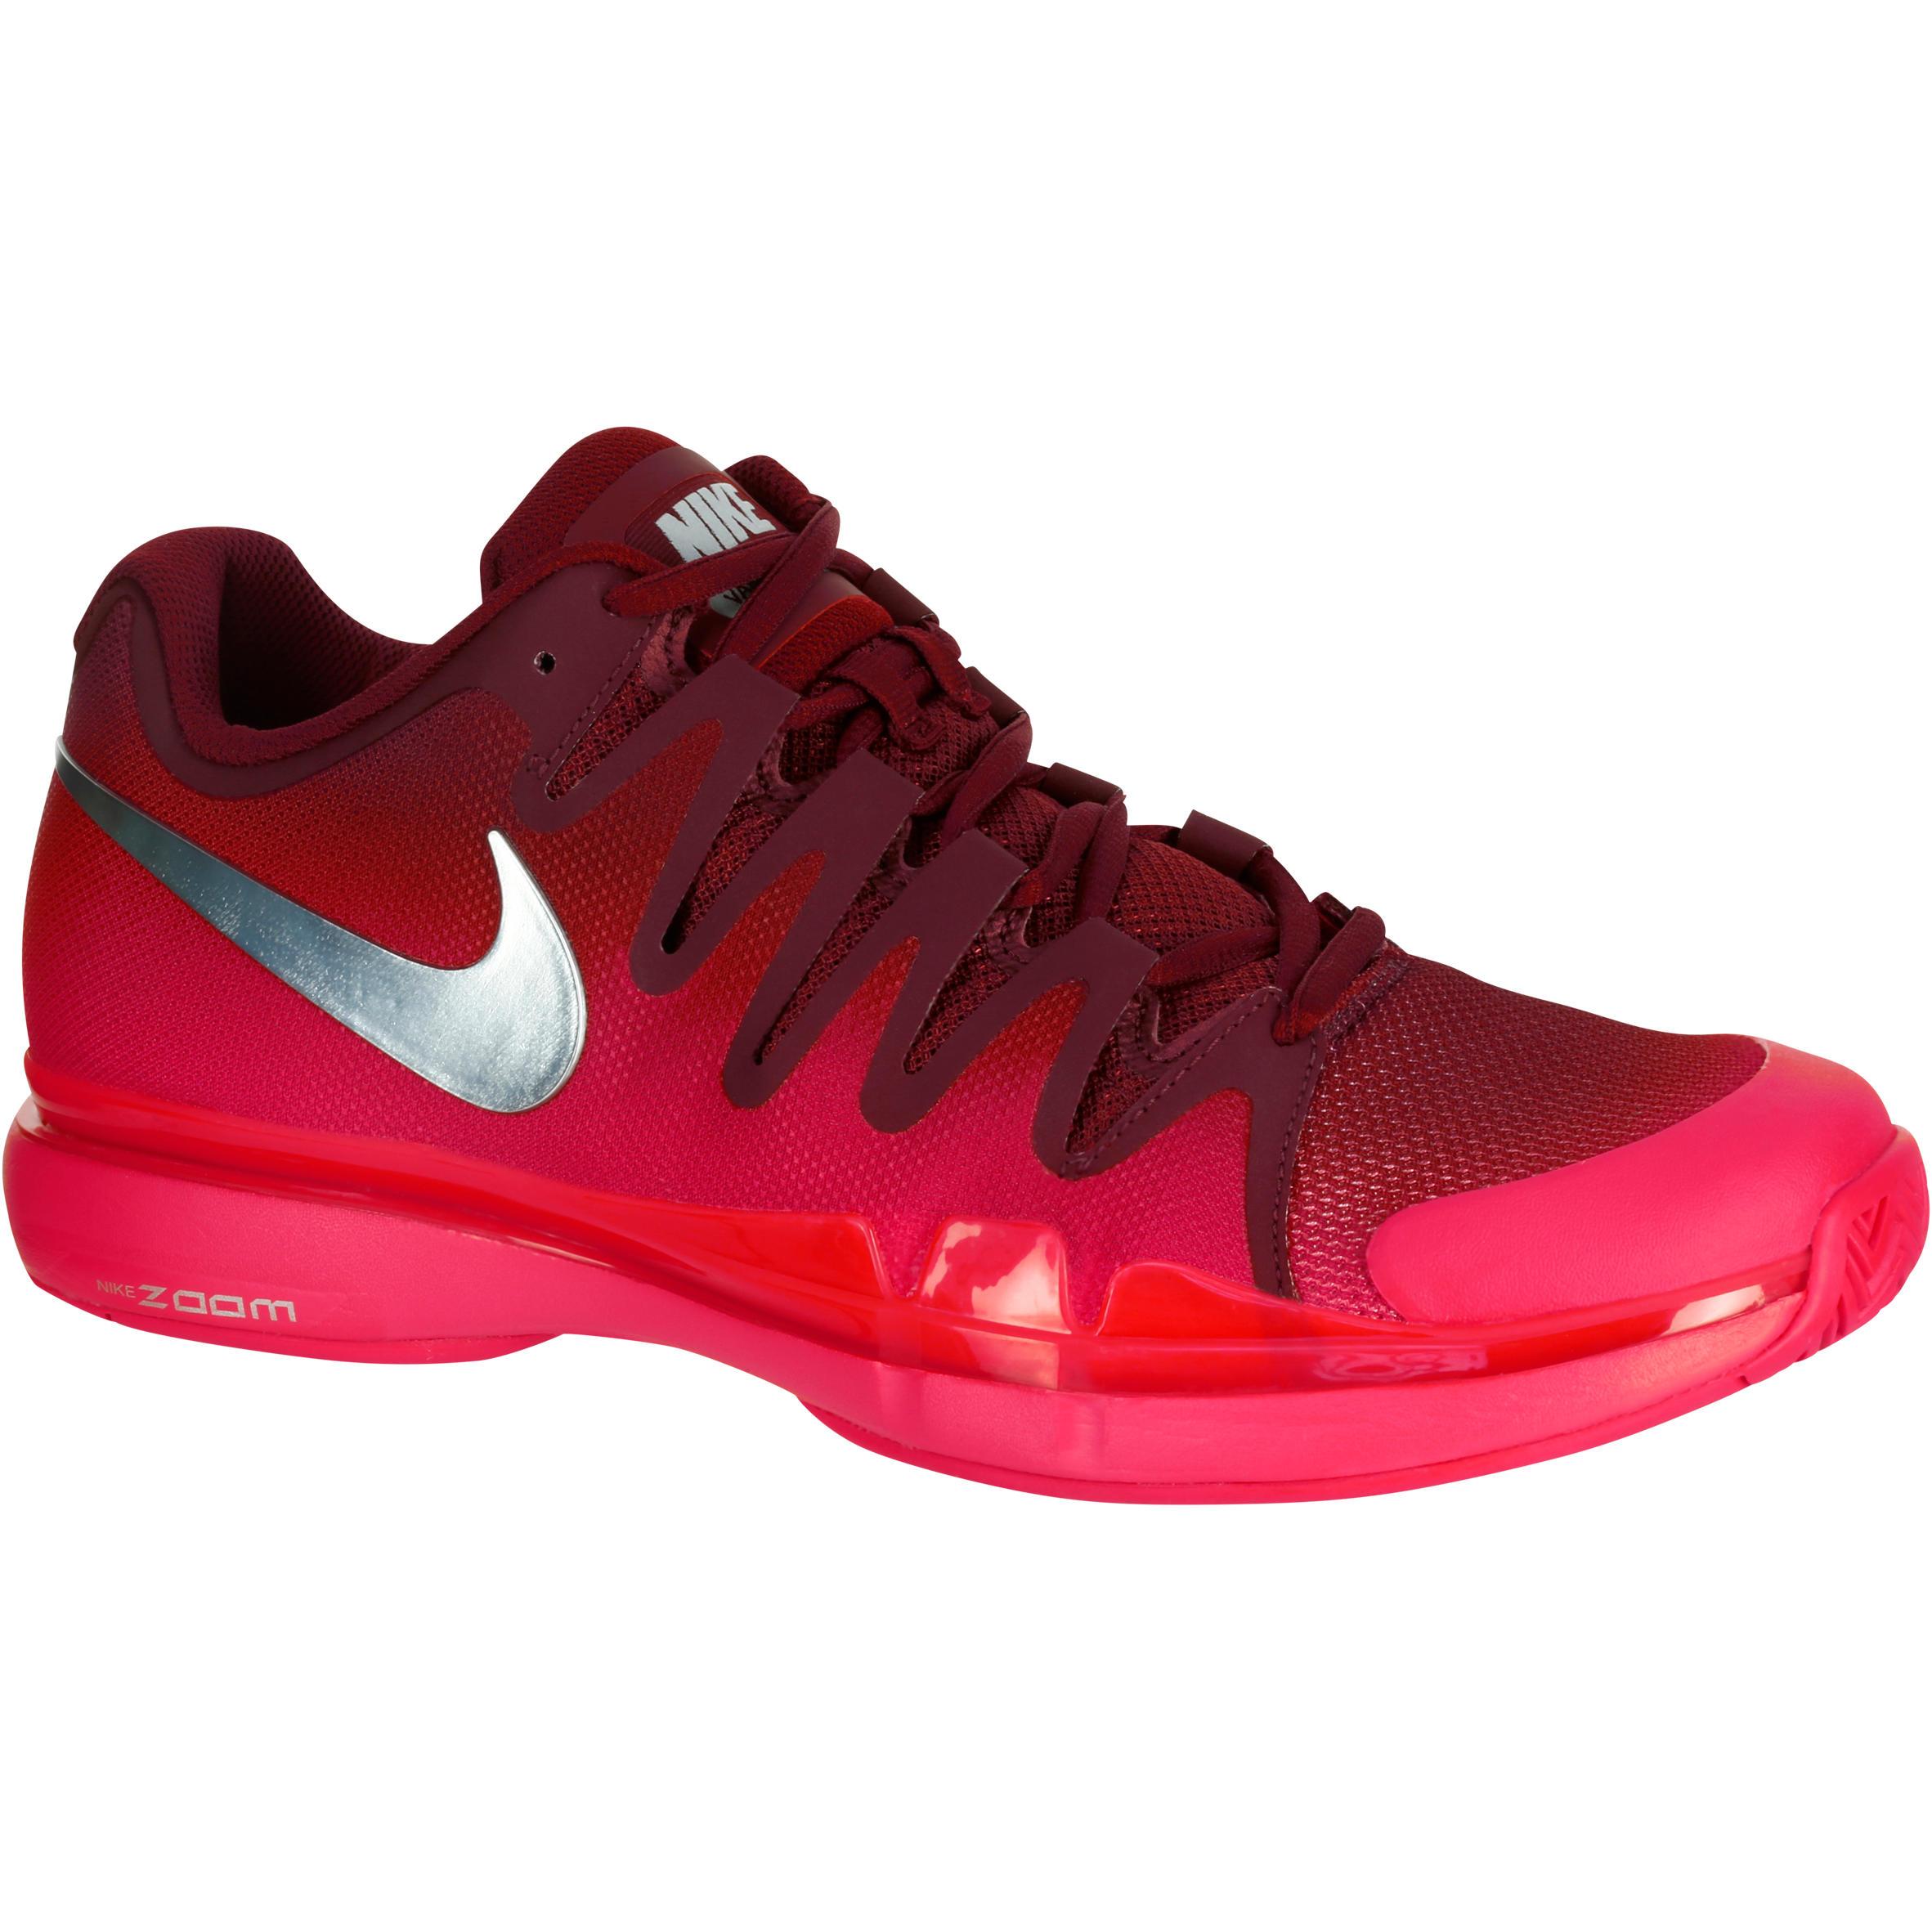 a2fef9ebe76 9 Tennis De Chaussure Nike Zoom Chaussures Tour Junior Vapor 5 8Pdqg